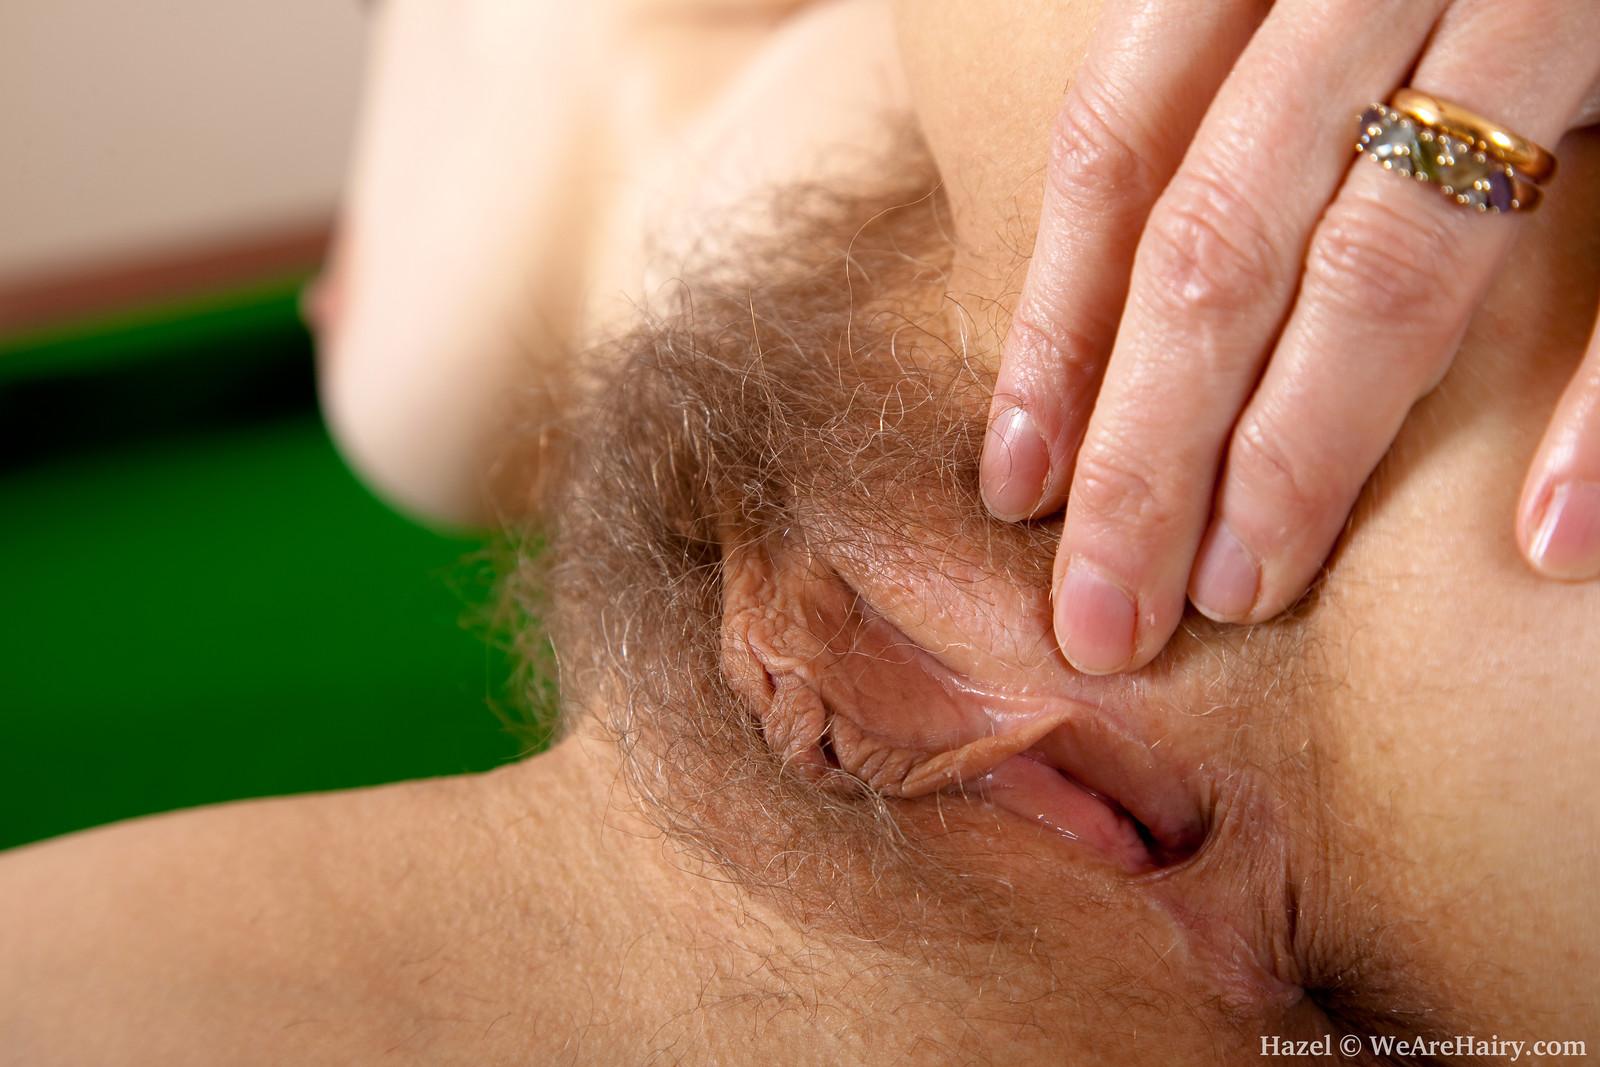 ... lesbian girls with hairy armpit, hairy mainpage @ Hairy Naked Girls